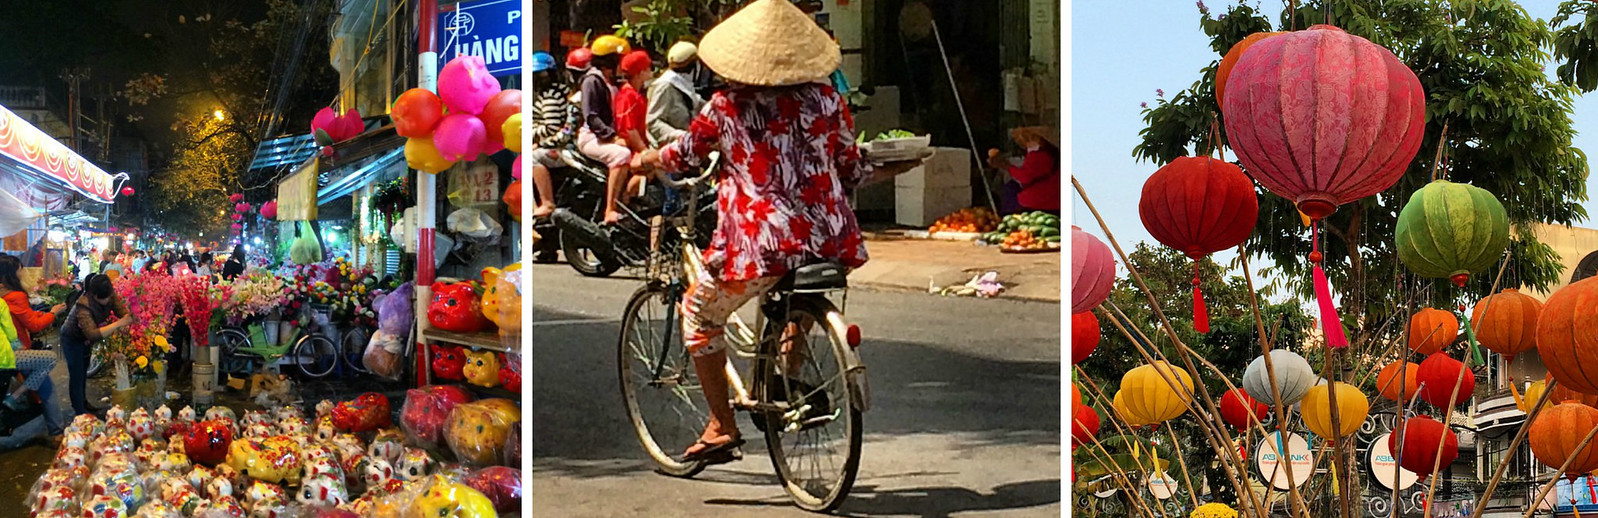 PicMonkey Collage vietnam